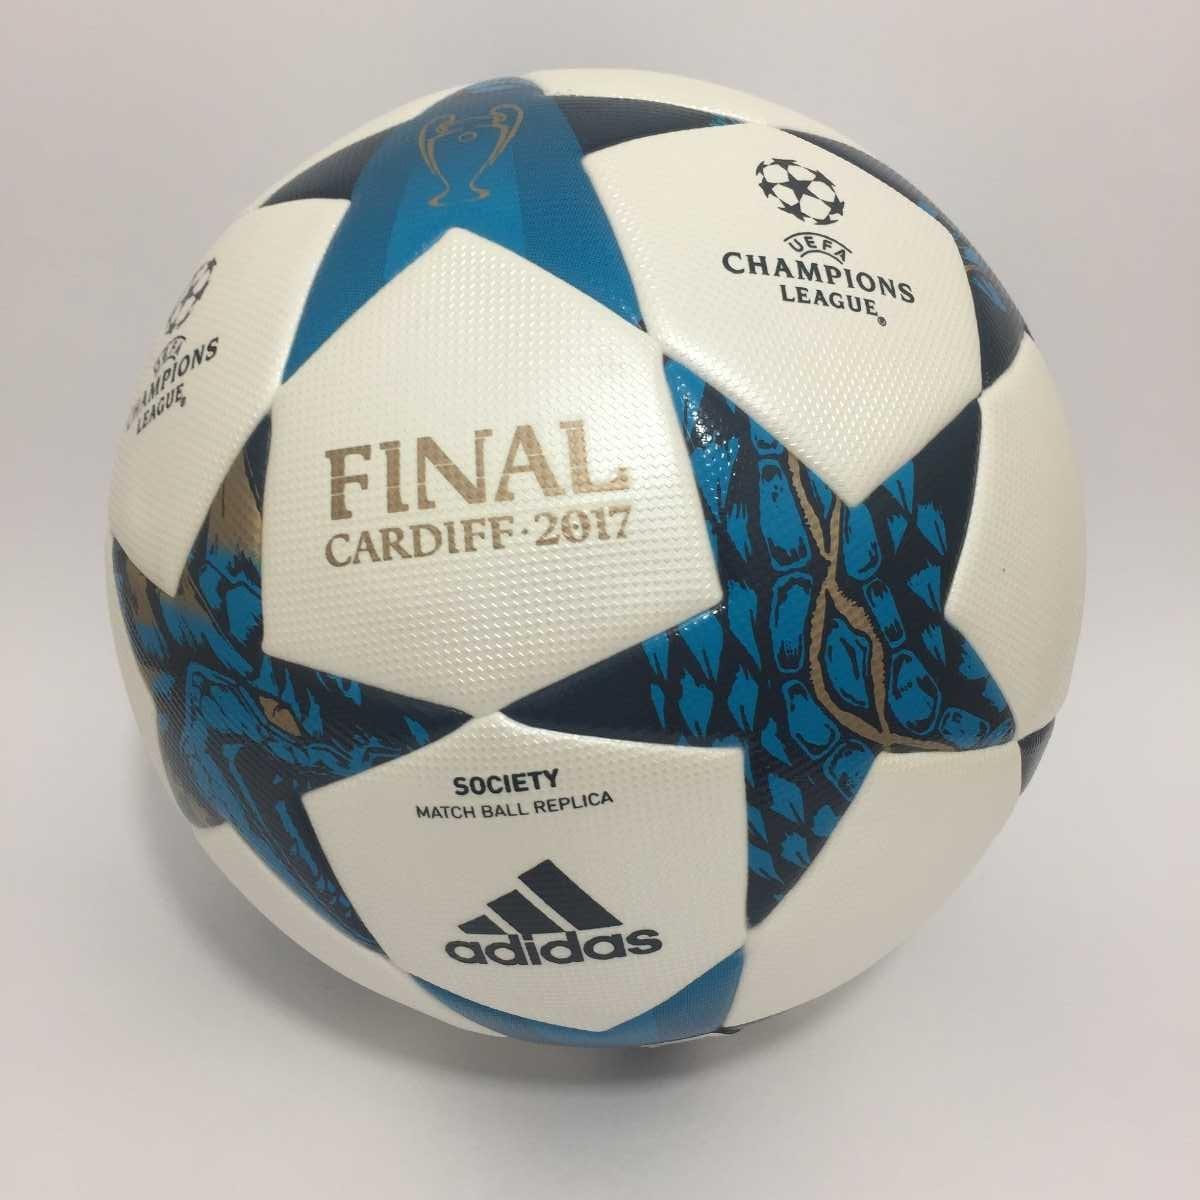 bola adidas champions league finale society futebol original. Carregando  zoom. 6267cdb15b5a1